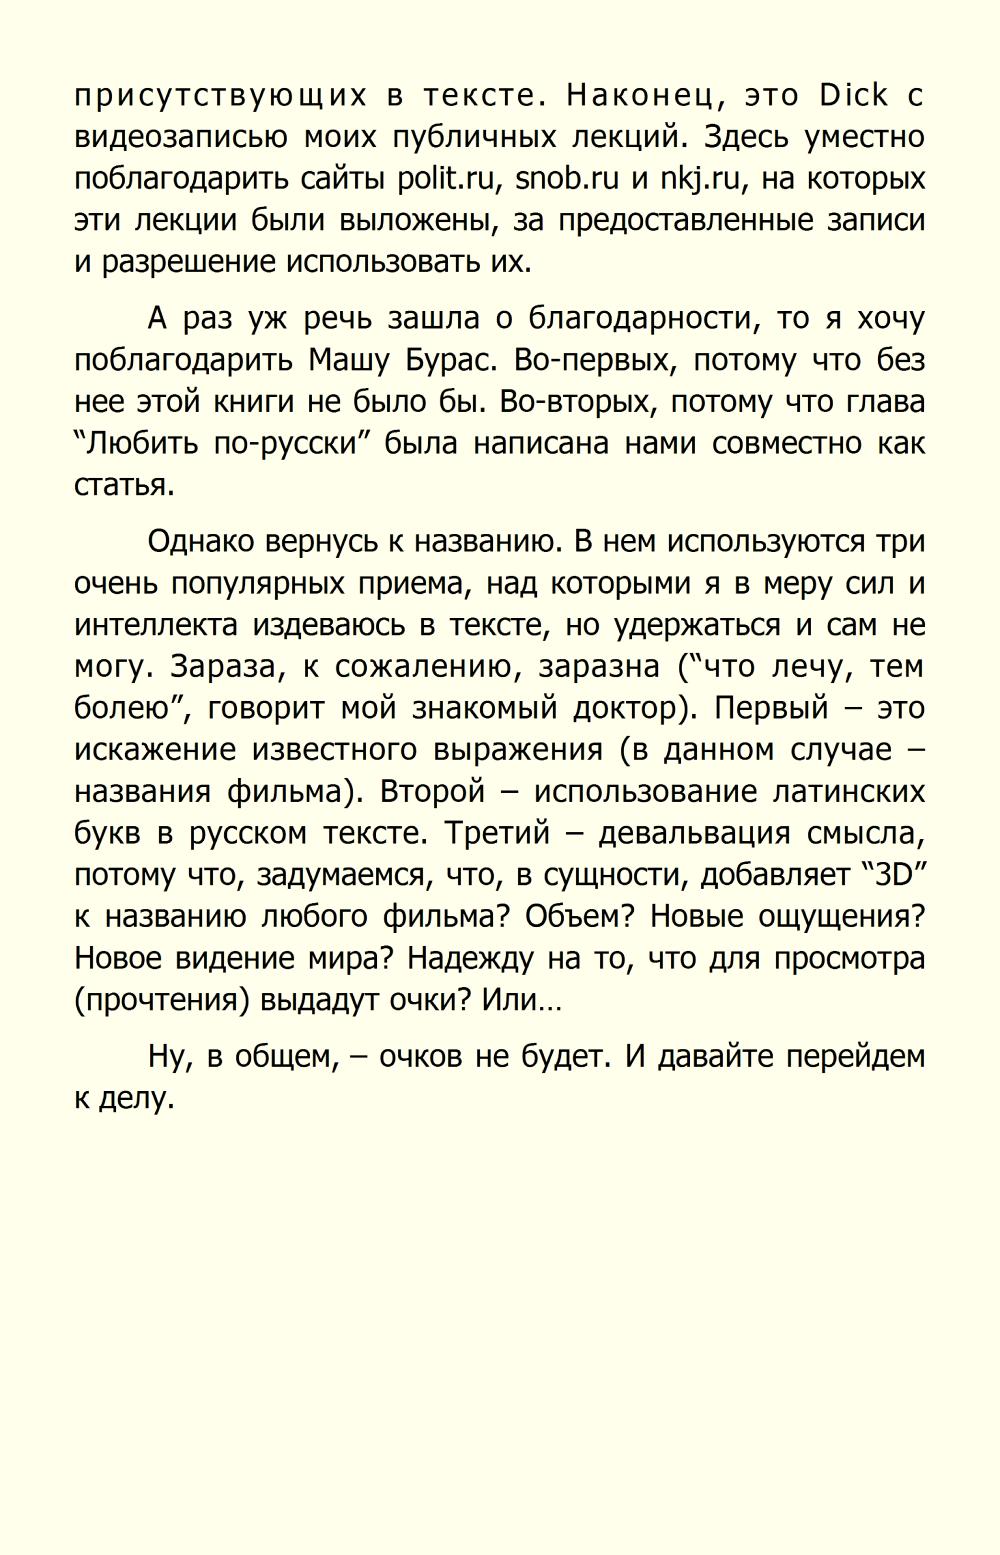 http://i6.imageban.ru/out/2013/11/27/8784d47c033501ca88cbef3332b22811.jpg